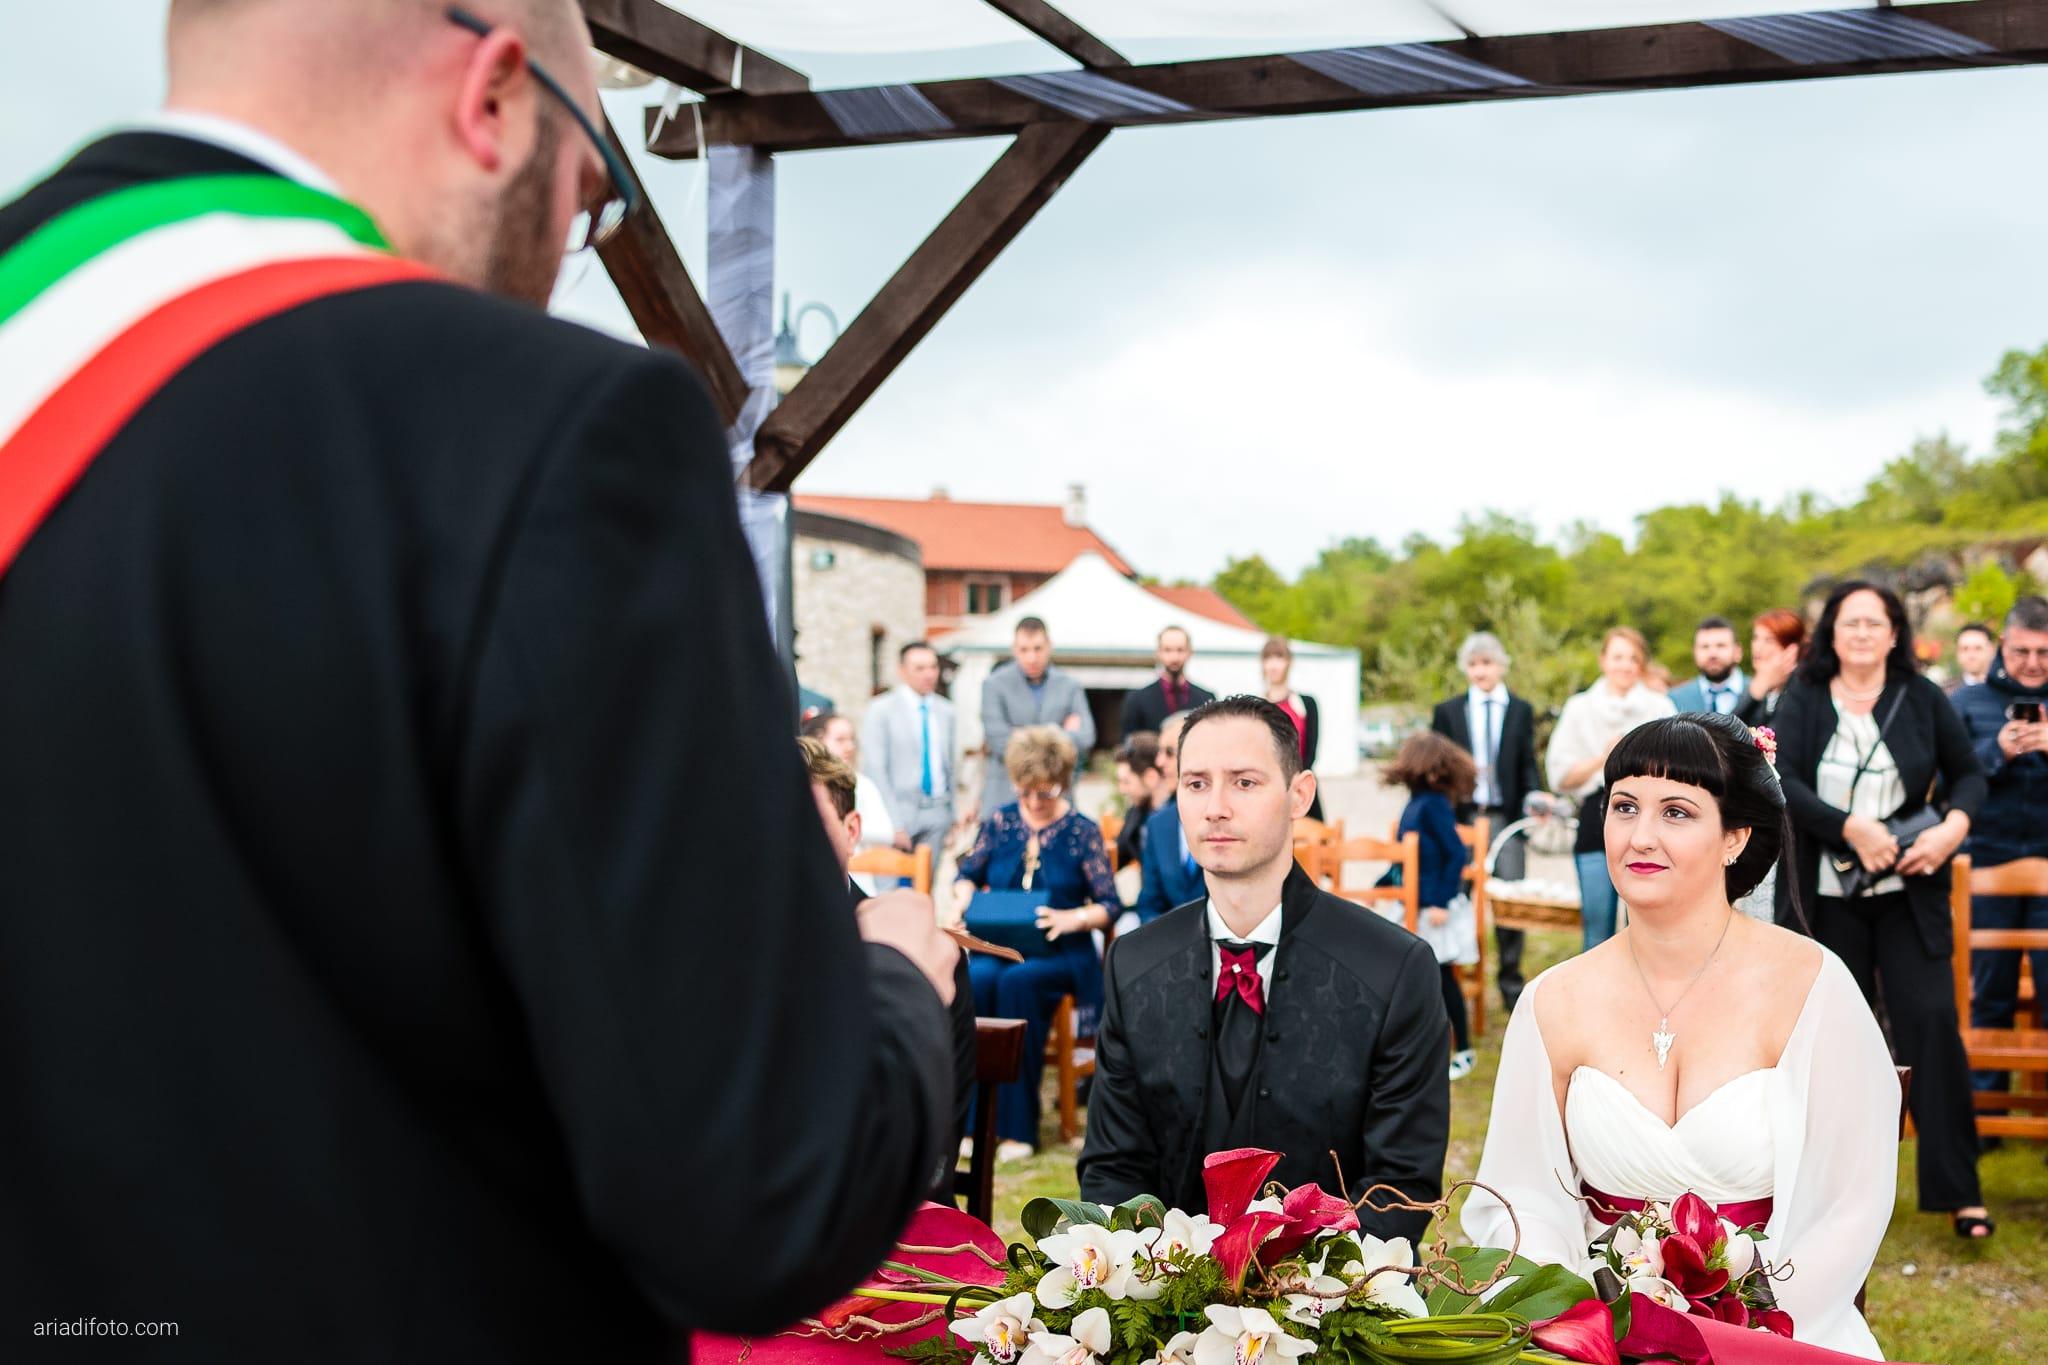 Agnese Alessandro Matrimonio Centro Visite Gradina Doberdo Gorizia Farra cerimonia